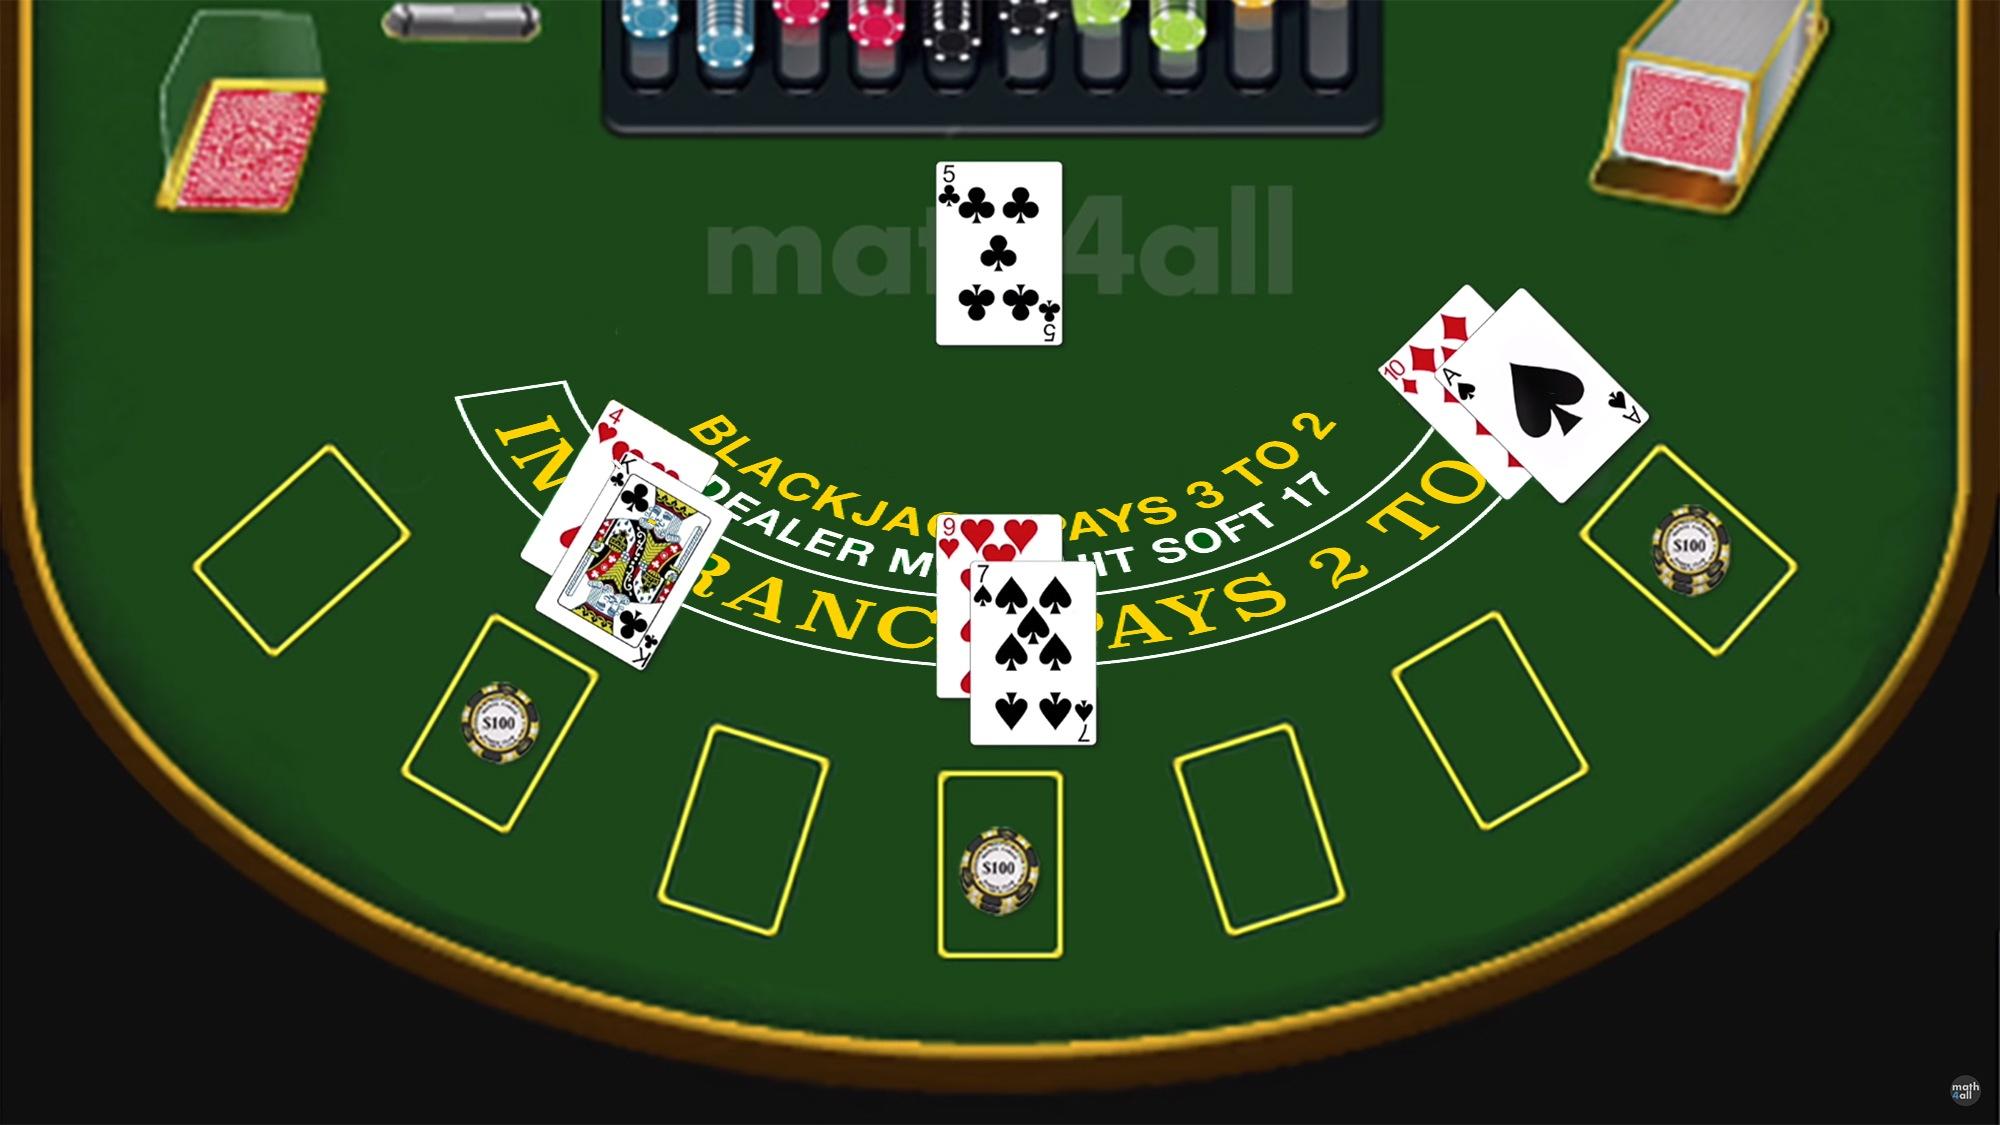 each way betting rules of blackjack